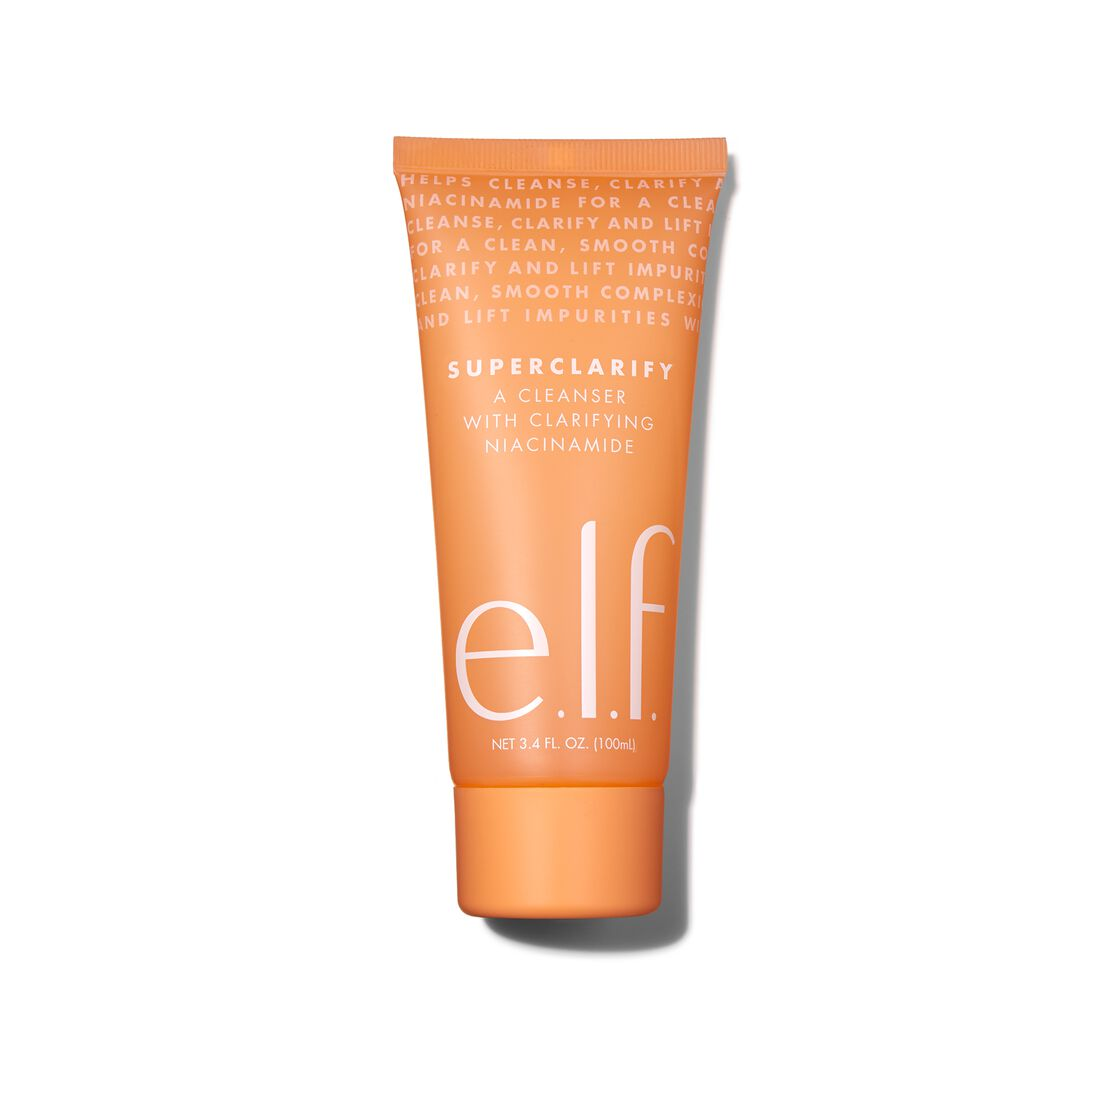 ELF Cosmetics - SuperClarify Cleanser